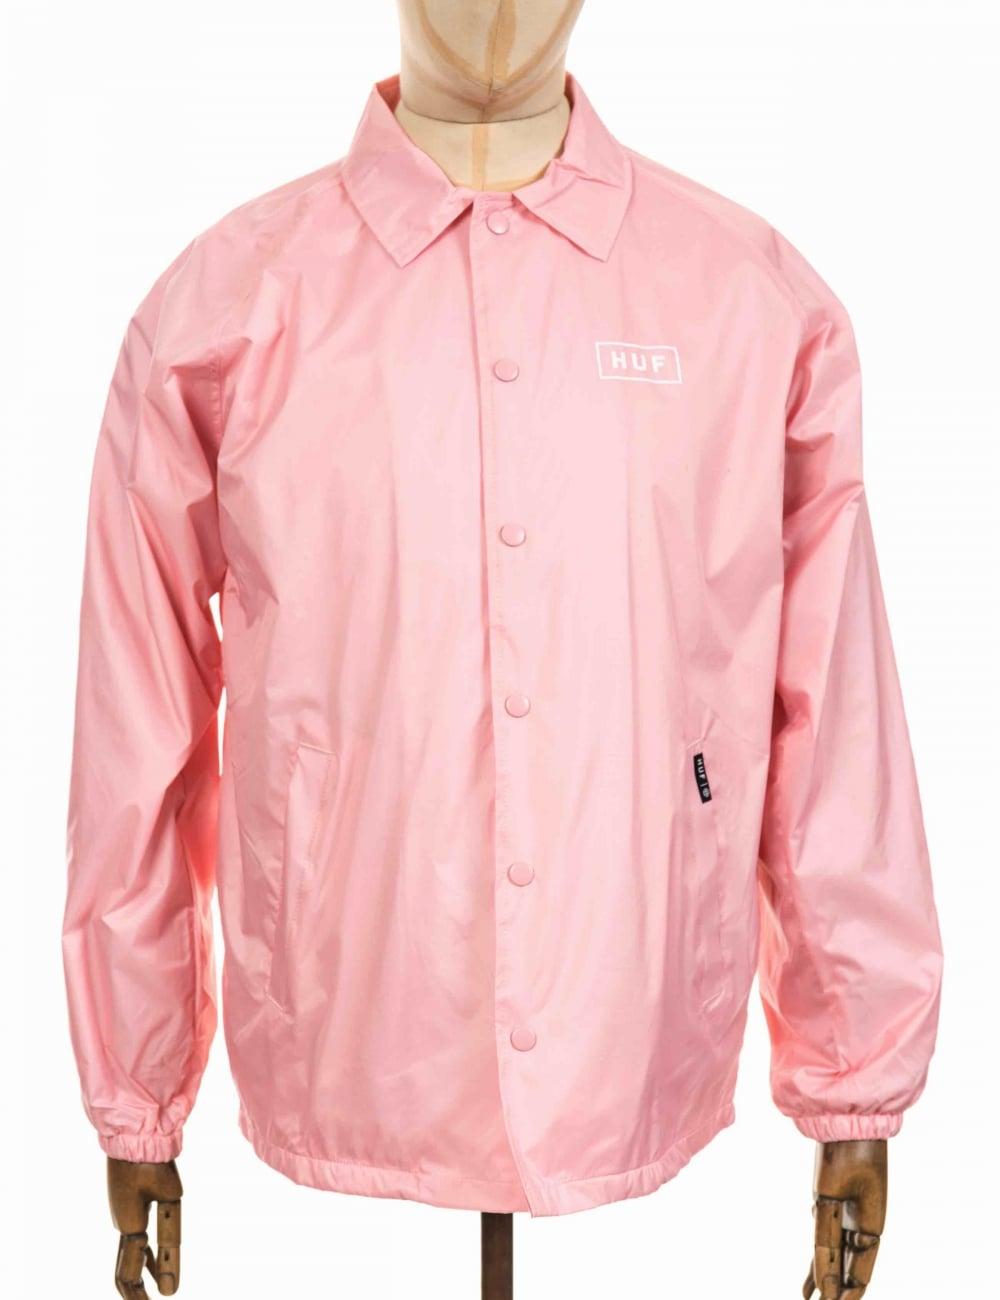 7c0324944e21fc Huf box logo coach jacket pink clothing from fat buddha store jpg 1000x1300 Pink  coach jacket